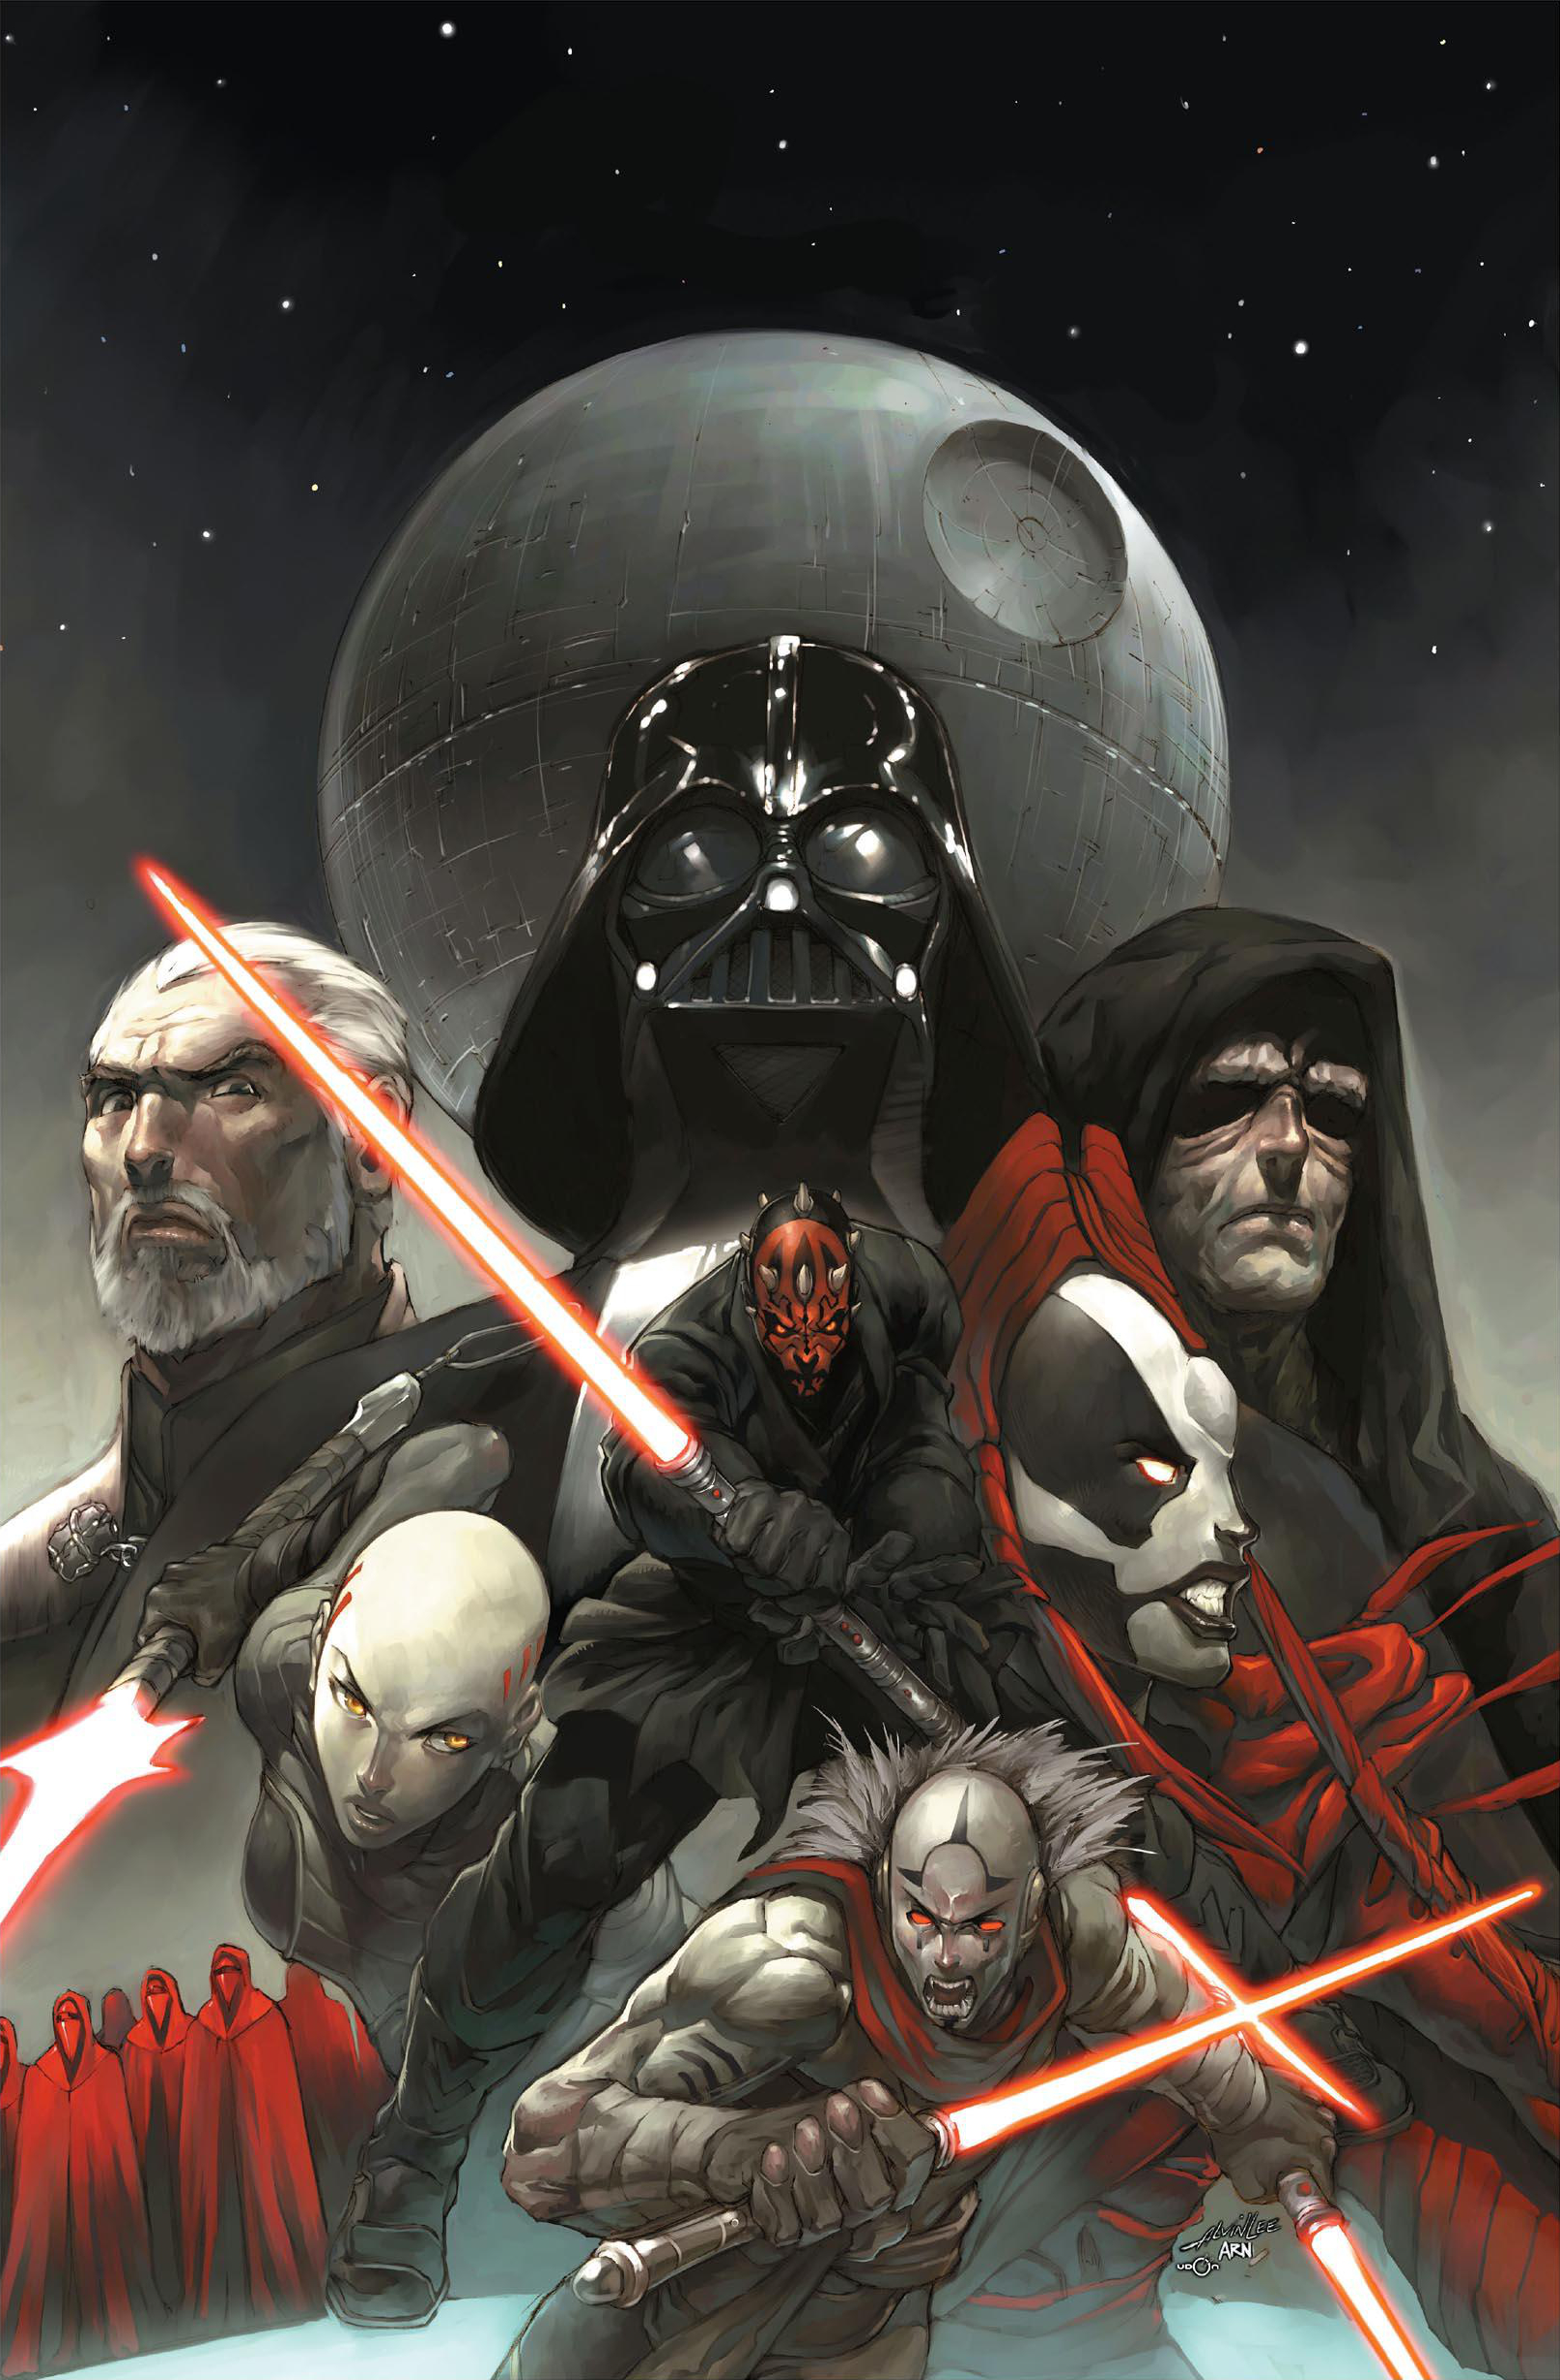 dark side of the force wookieepedia fandom powered by wikia